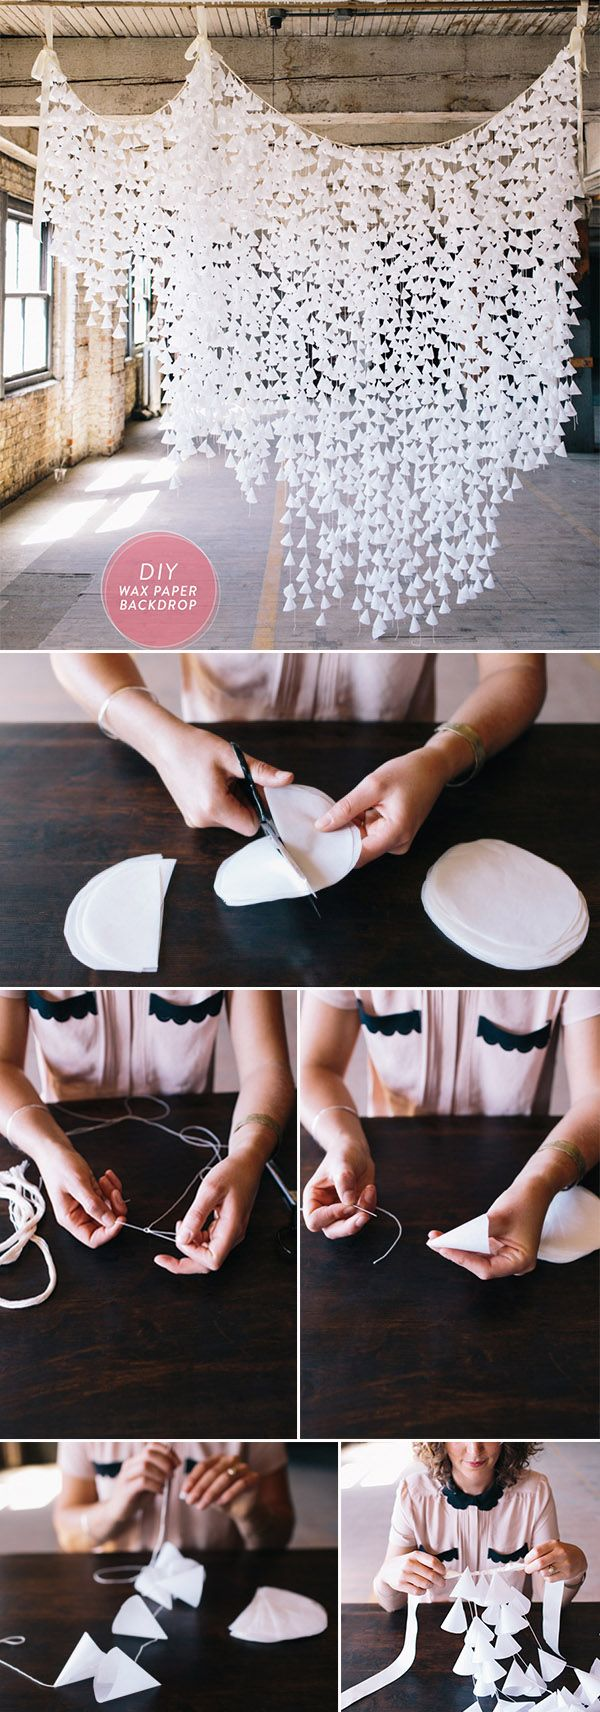 DIY Wedding Ideas: 10 Perfect Ways to Use Paper for Weddings #hochzeitsdeko